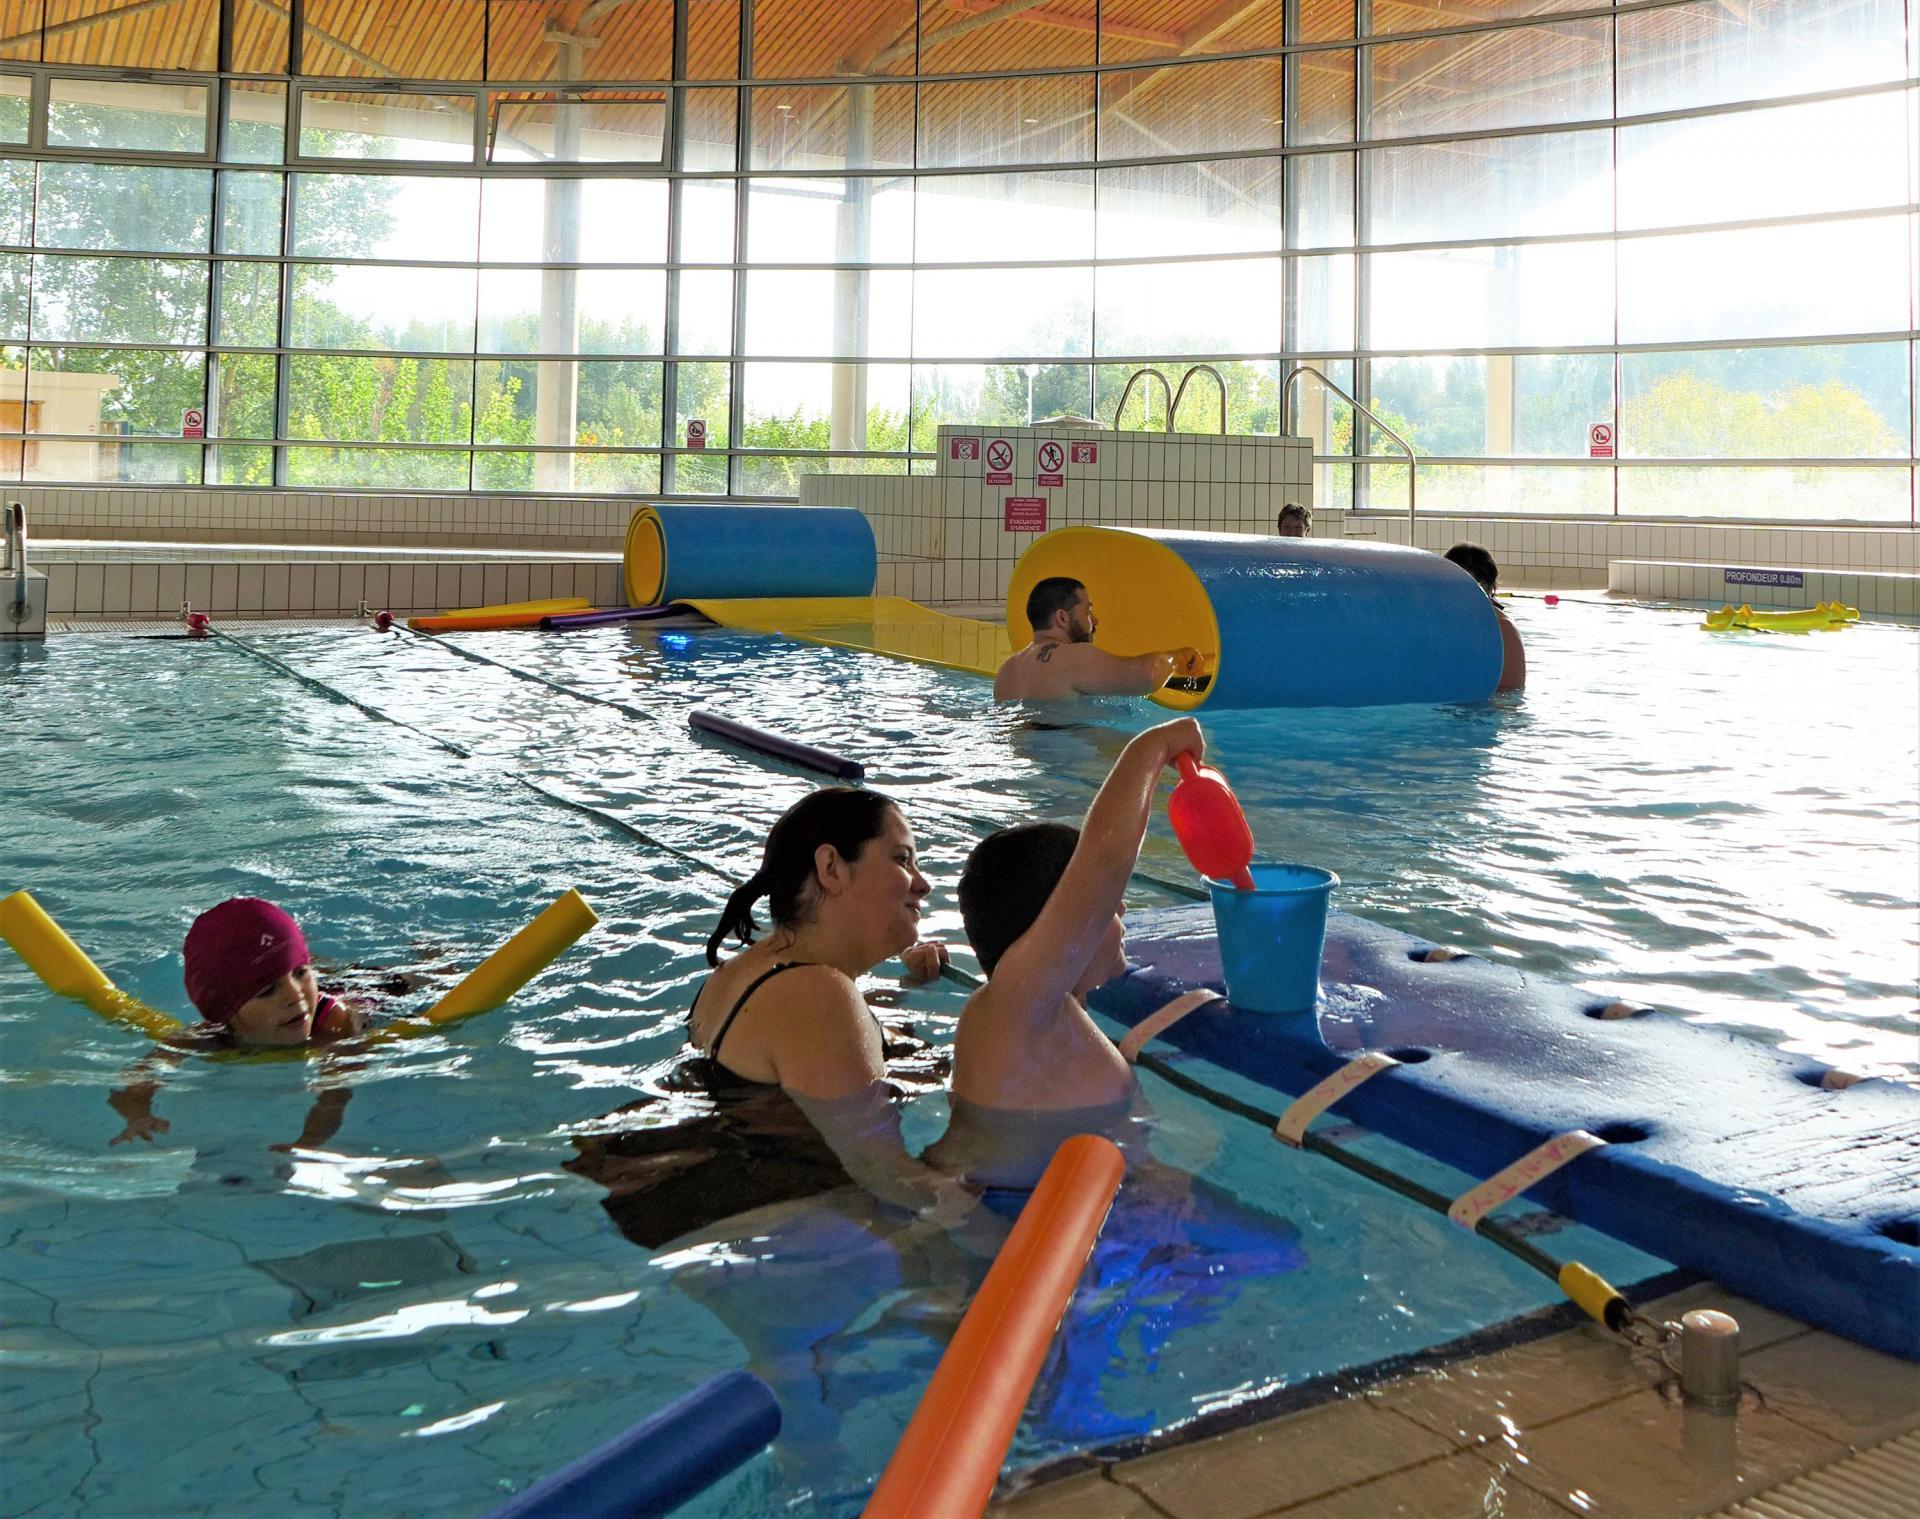 Centre Aquatique Atlantys concernant Toboggan Piscine Gonflable